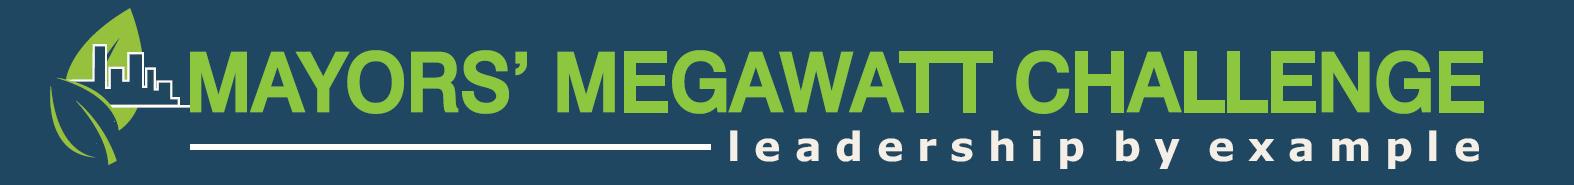 Mayors' Megawatt Challenge banner